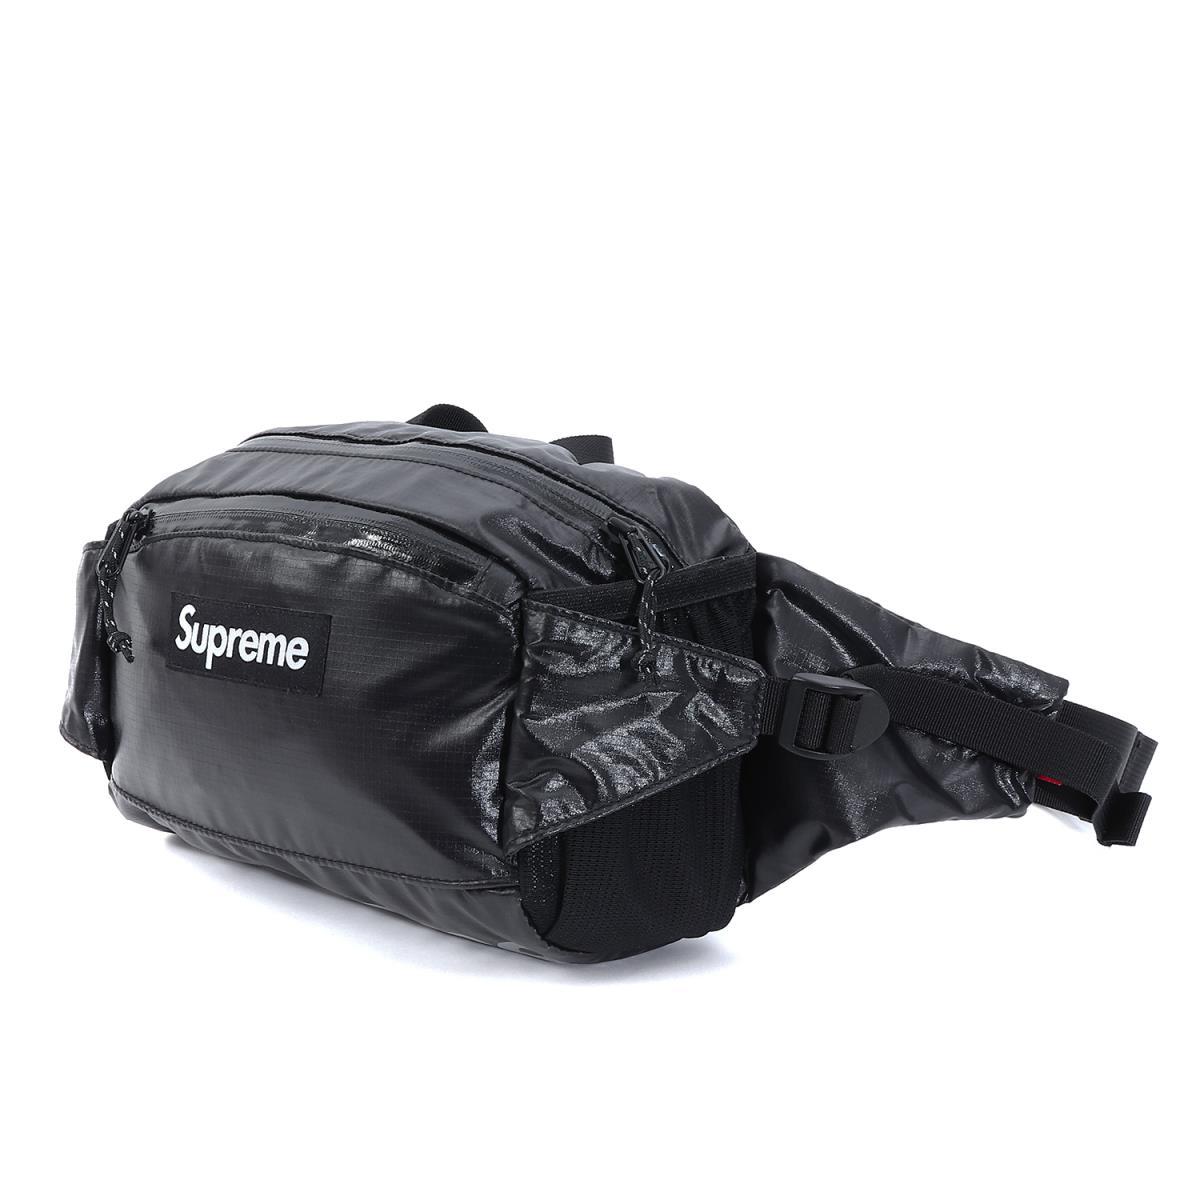 Supreme (シュプリーム) 17A/W シャイニーリップストップウエストバッグ(100D Cordura 4L Waist Bag) ブラック 【メンズ】【美品】【K2047】【中古】【あす楽☆対応可】